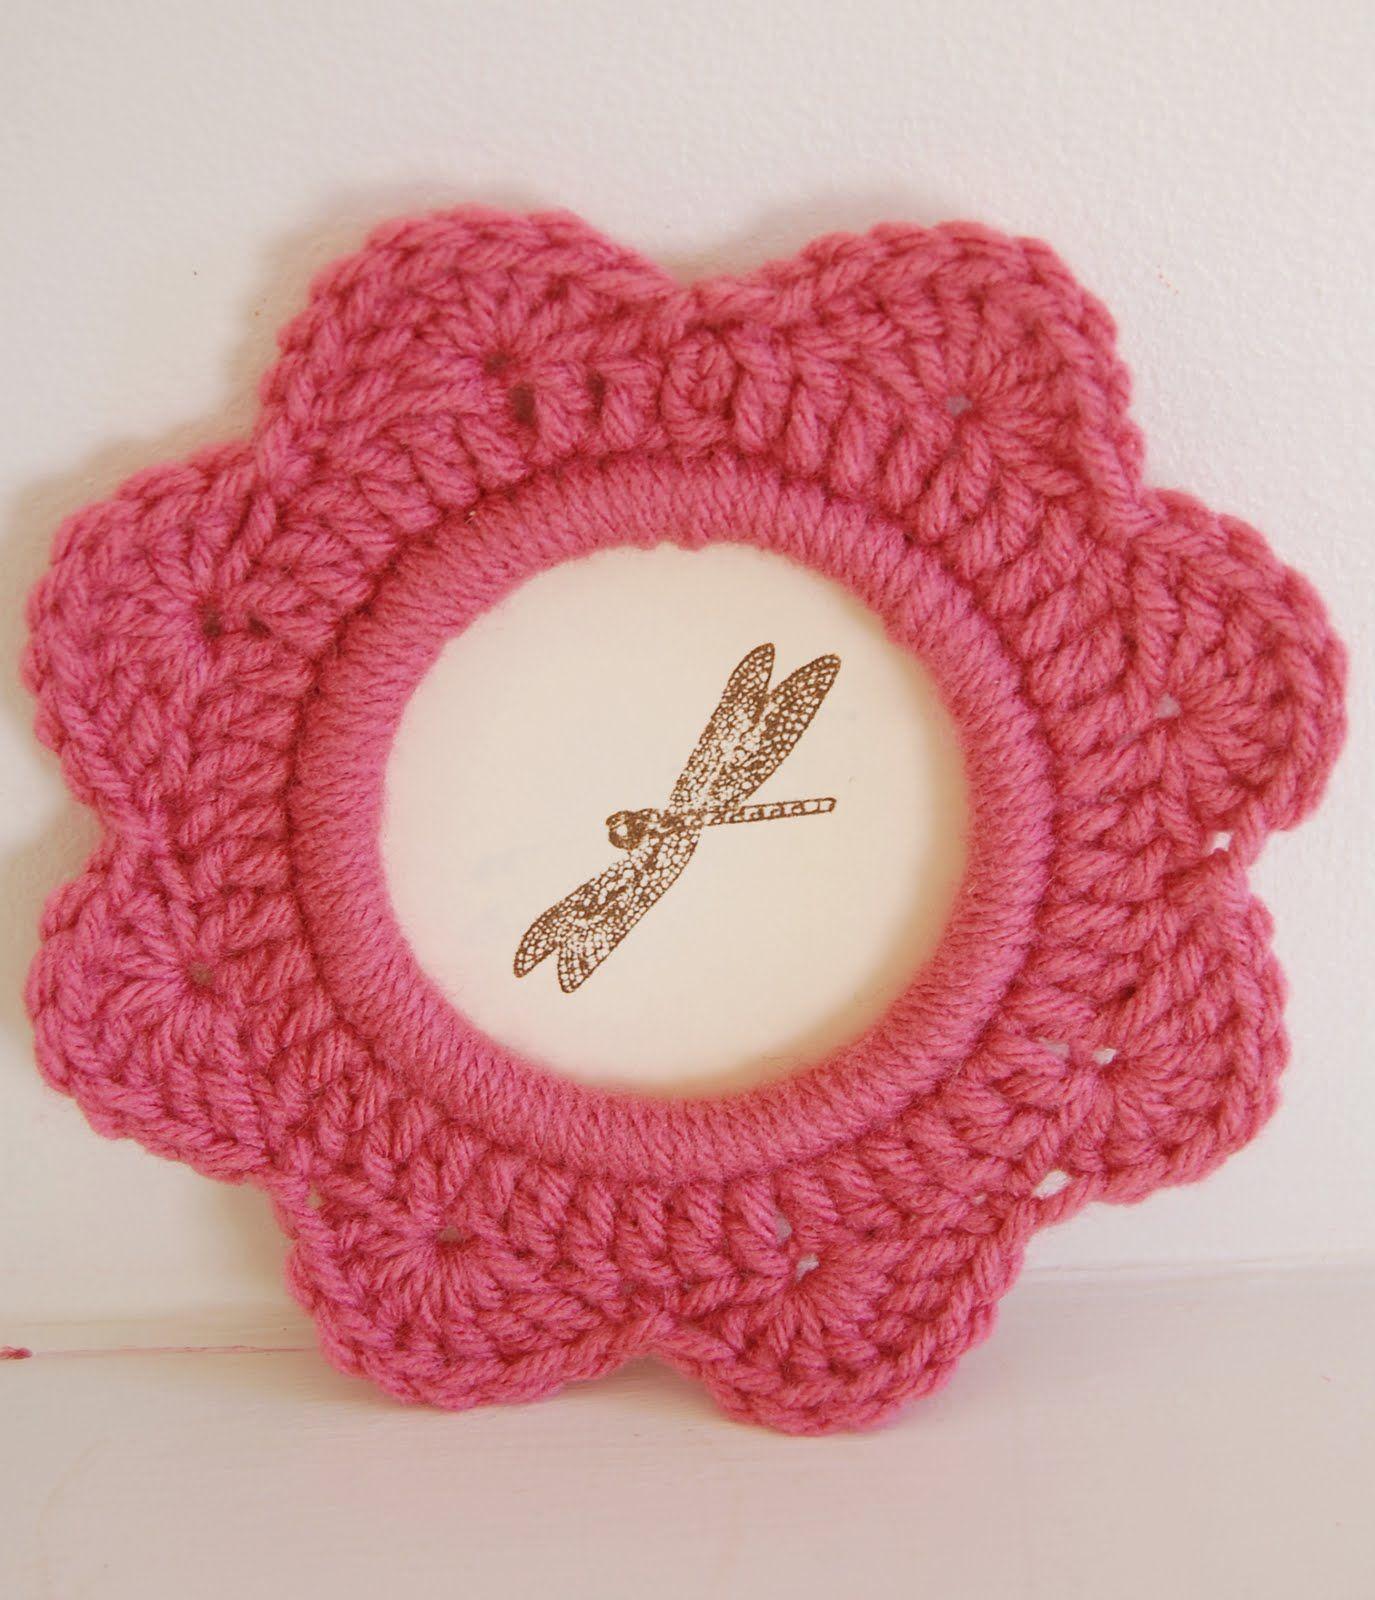 Marco de foto redondo | crochet varios | Pinterest | Kleinigkeiten ...